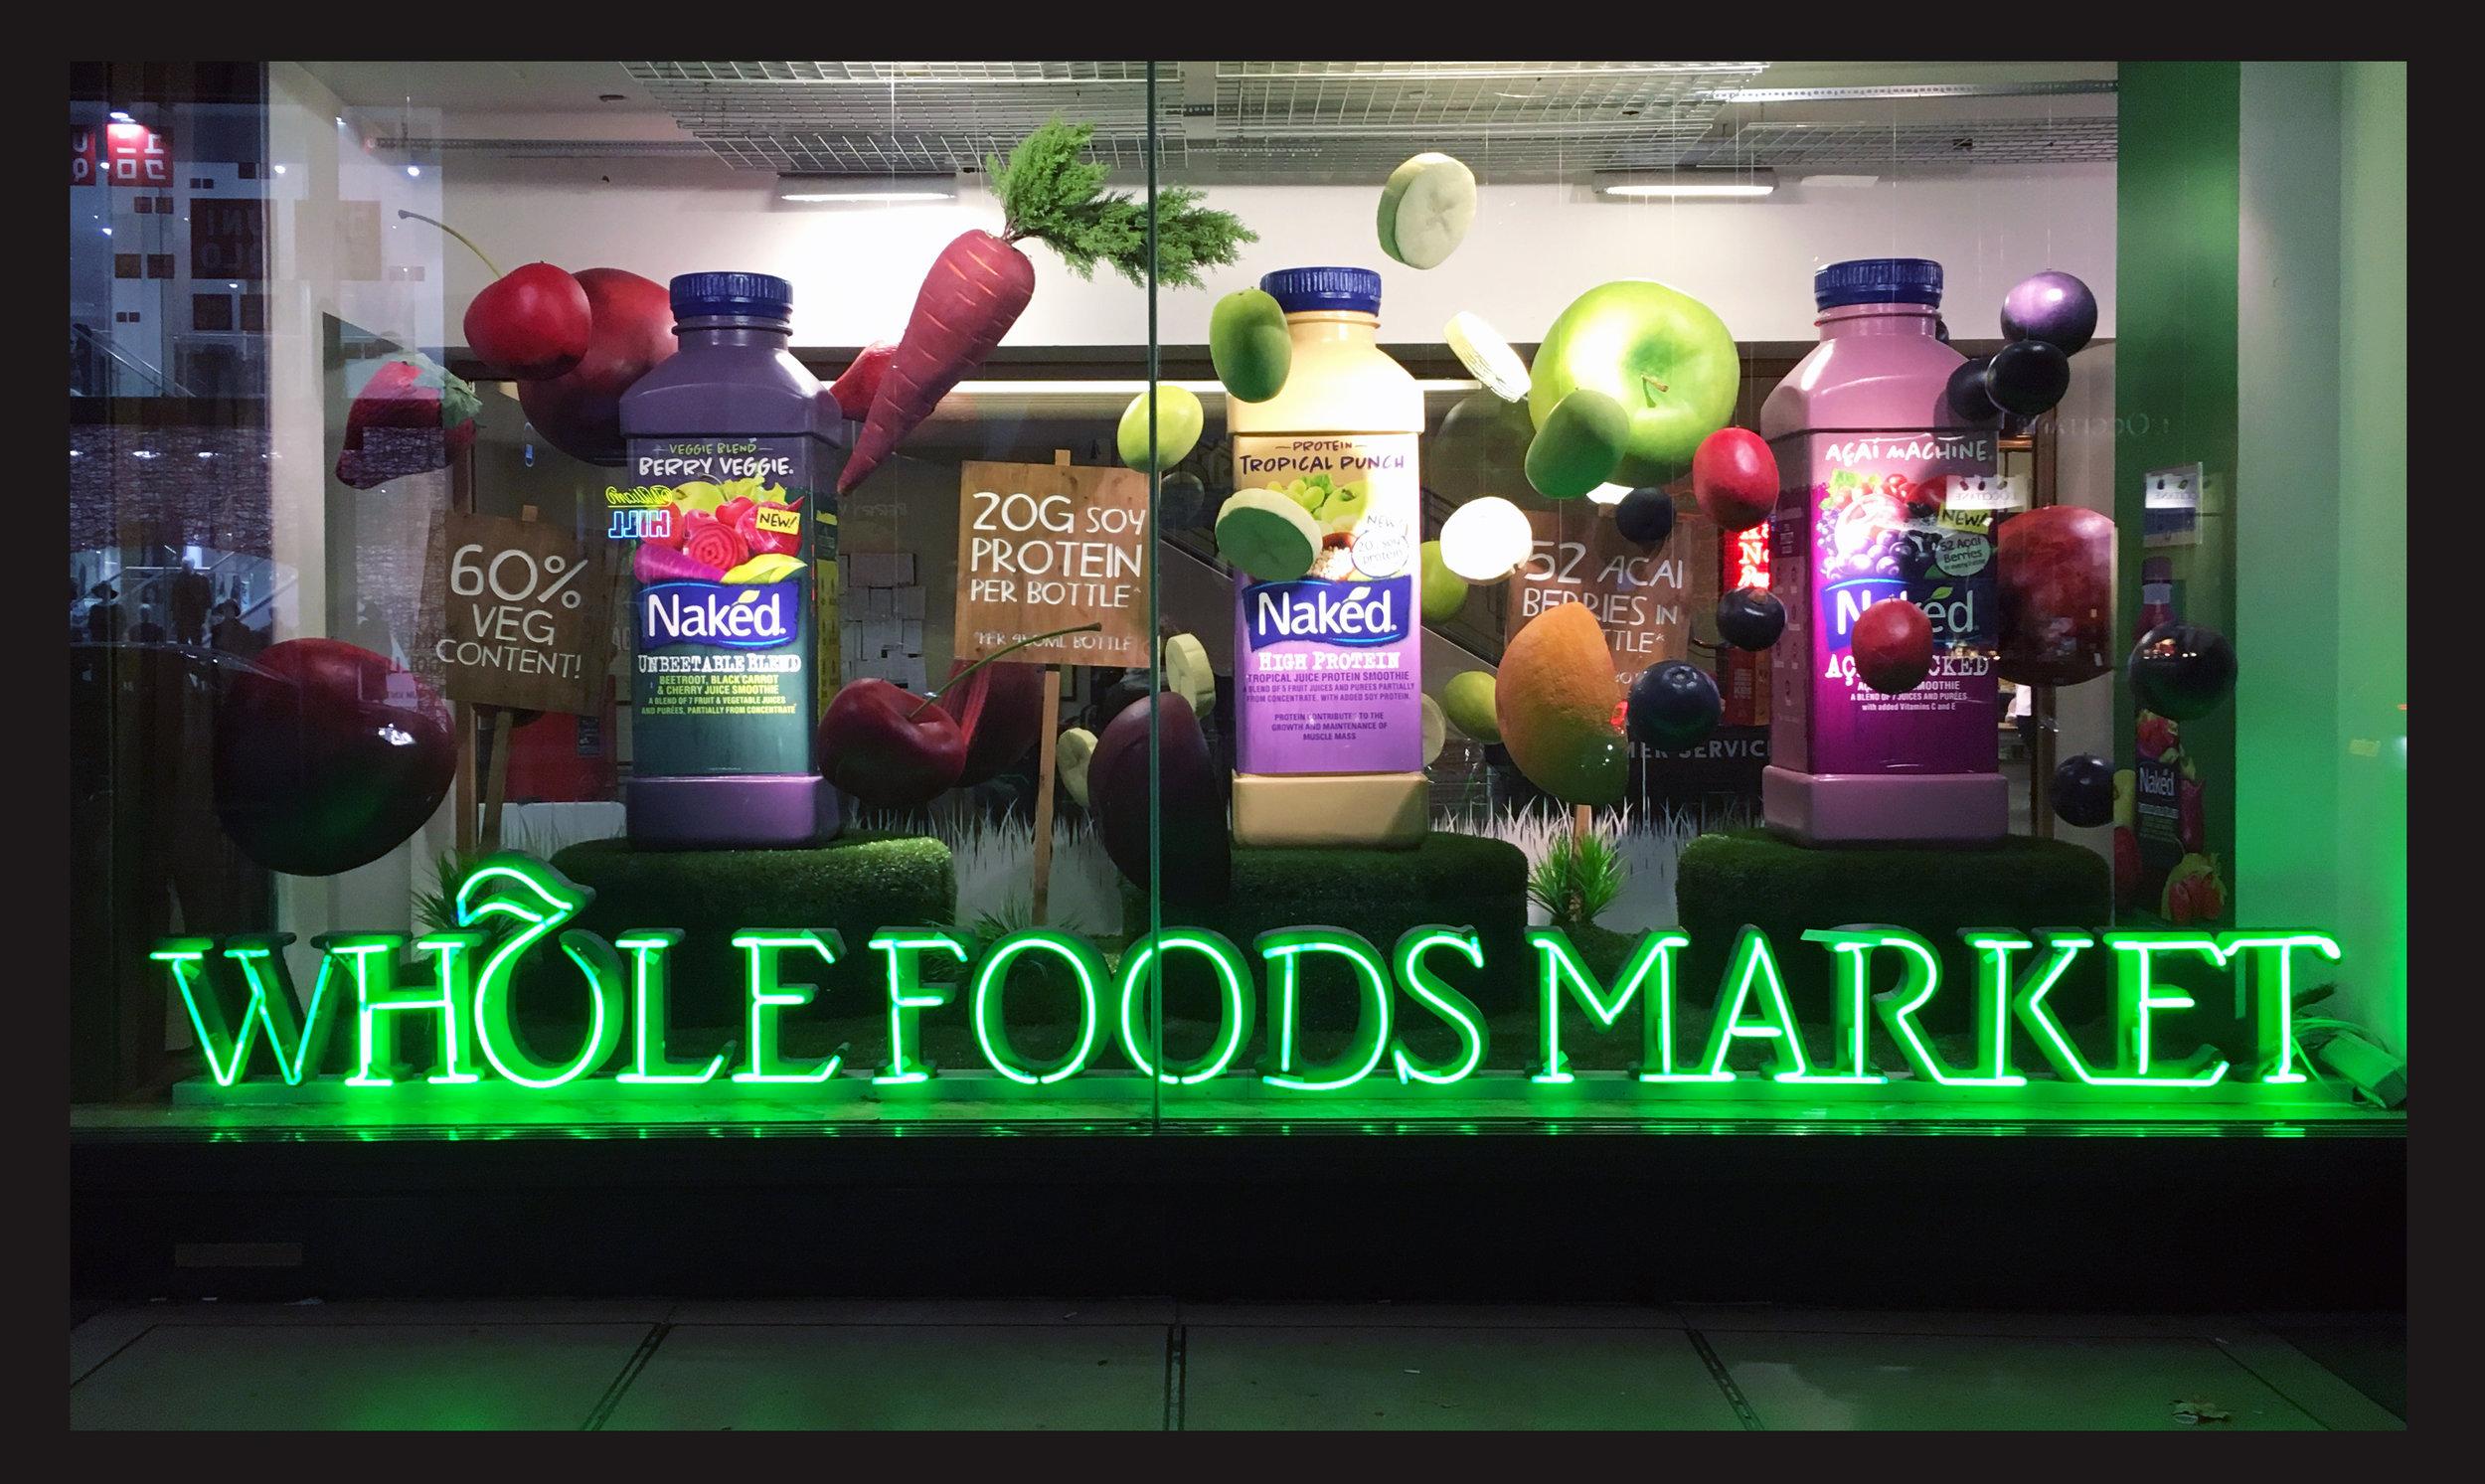 Naked Juice Window Display - Whole Foods Market - Spetember .jpg